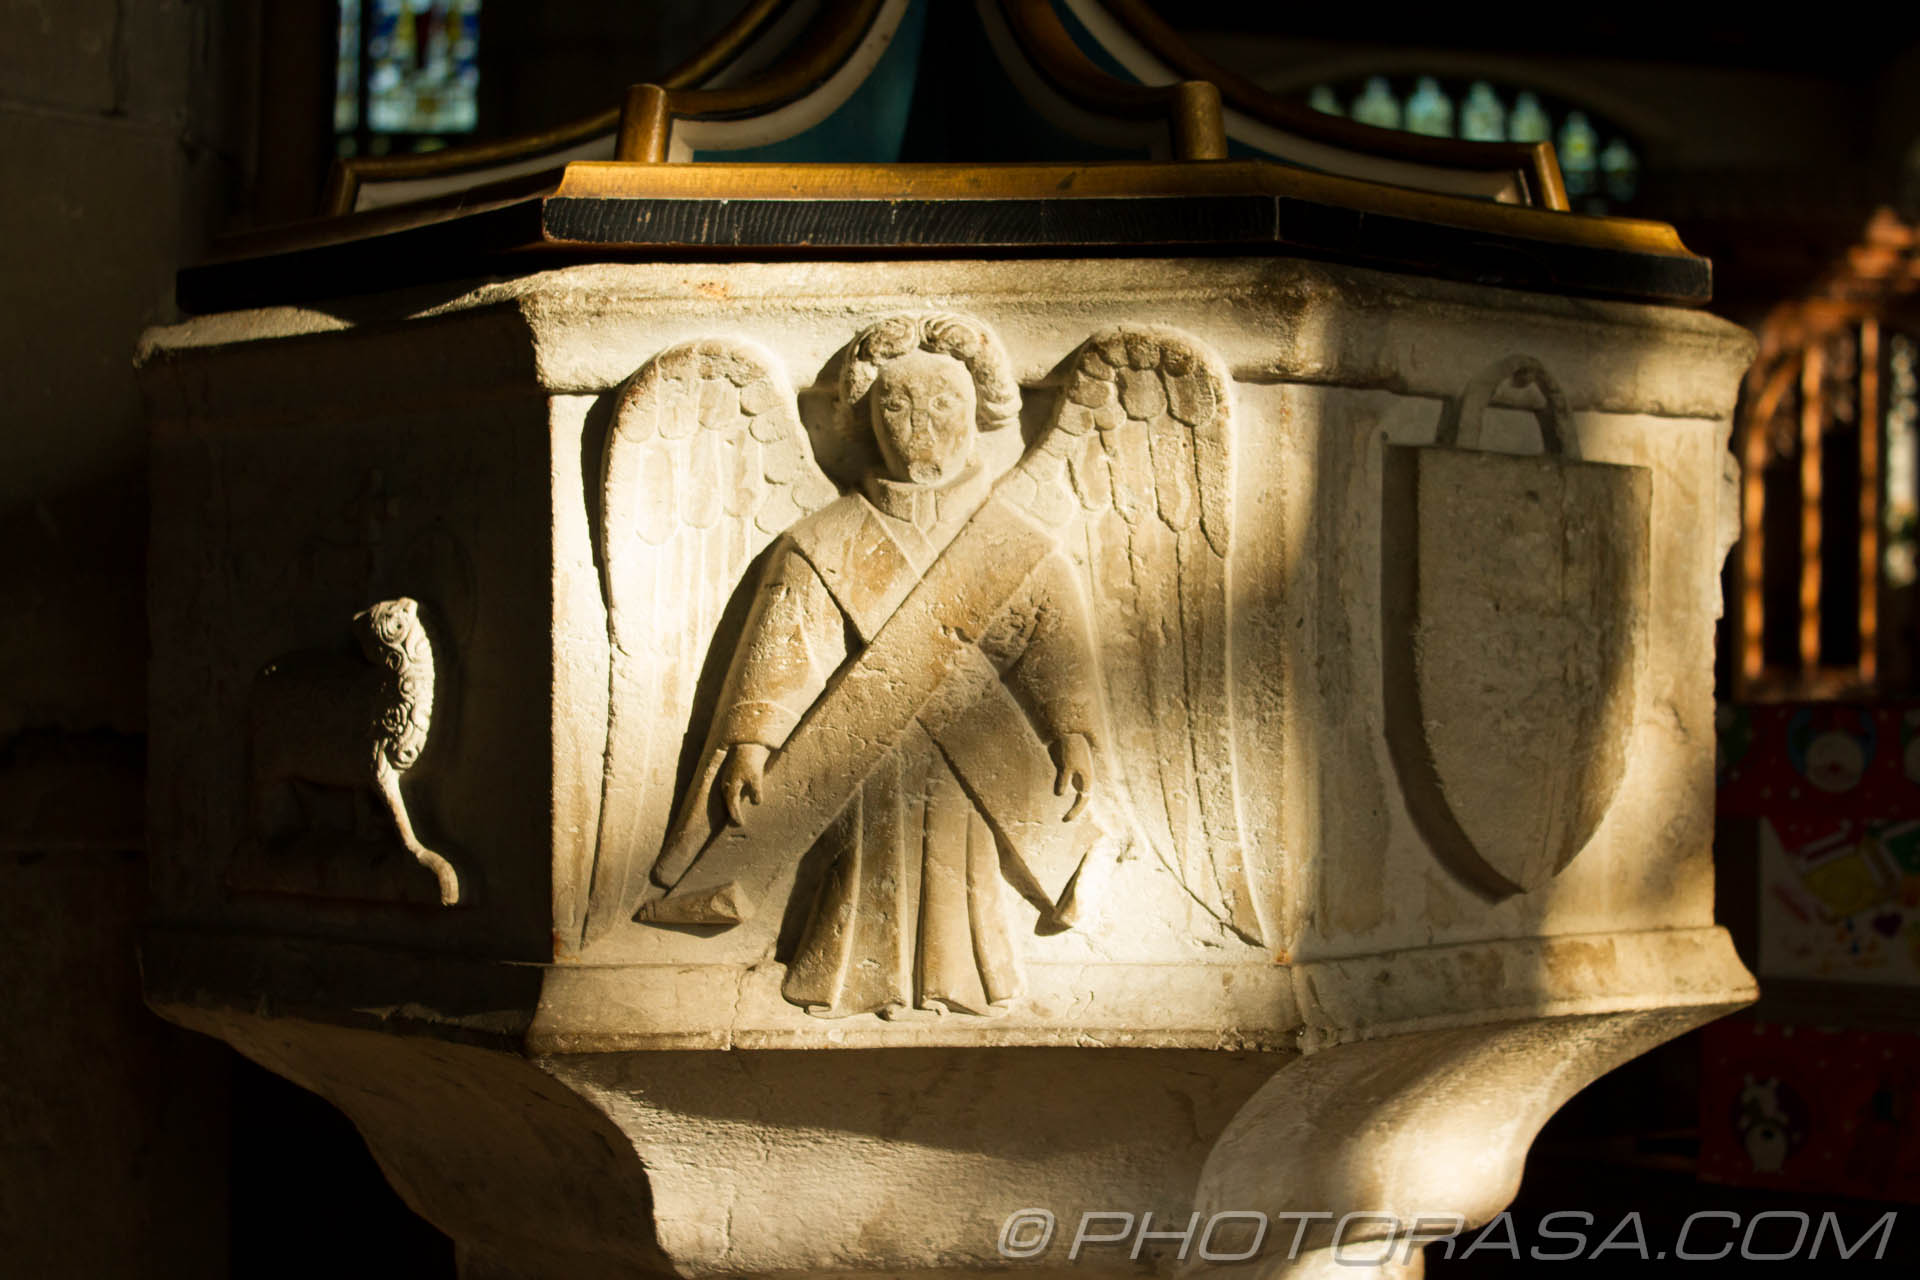 http://photorasa.com/parish-church-st-peter-st-paul-headcorn/markings-on-stone-font-featuring-lamb-of-god-angel-and-shield/